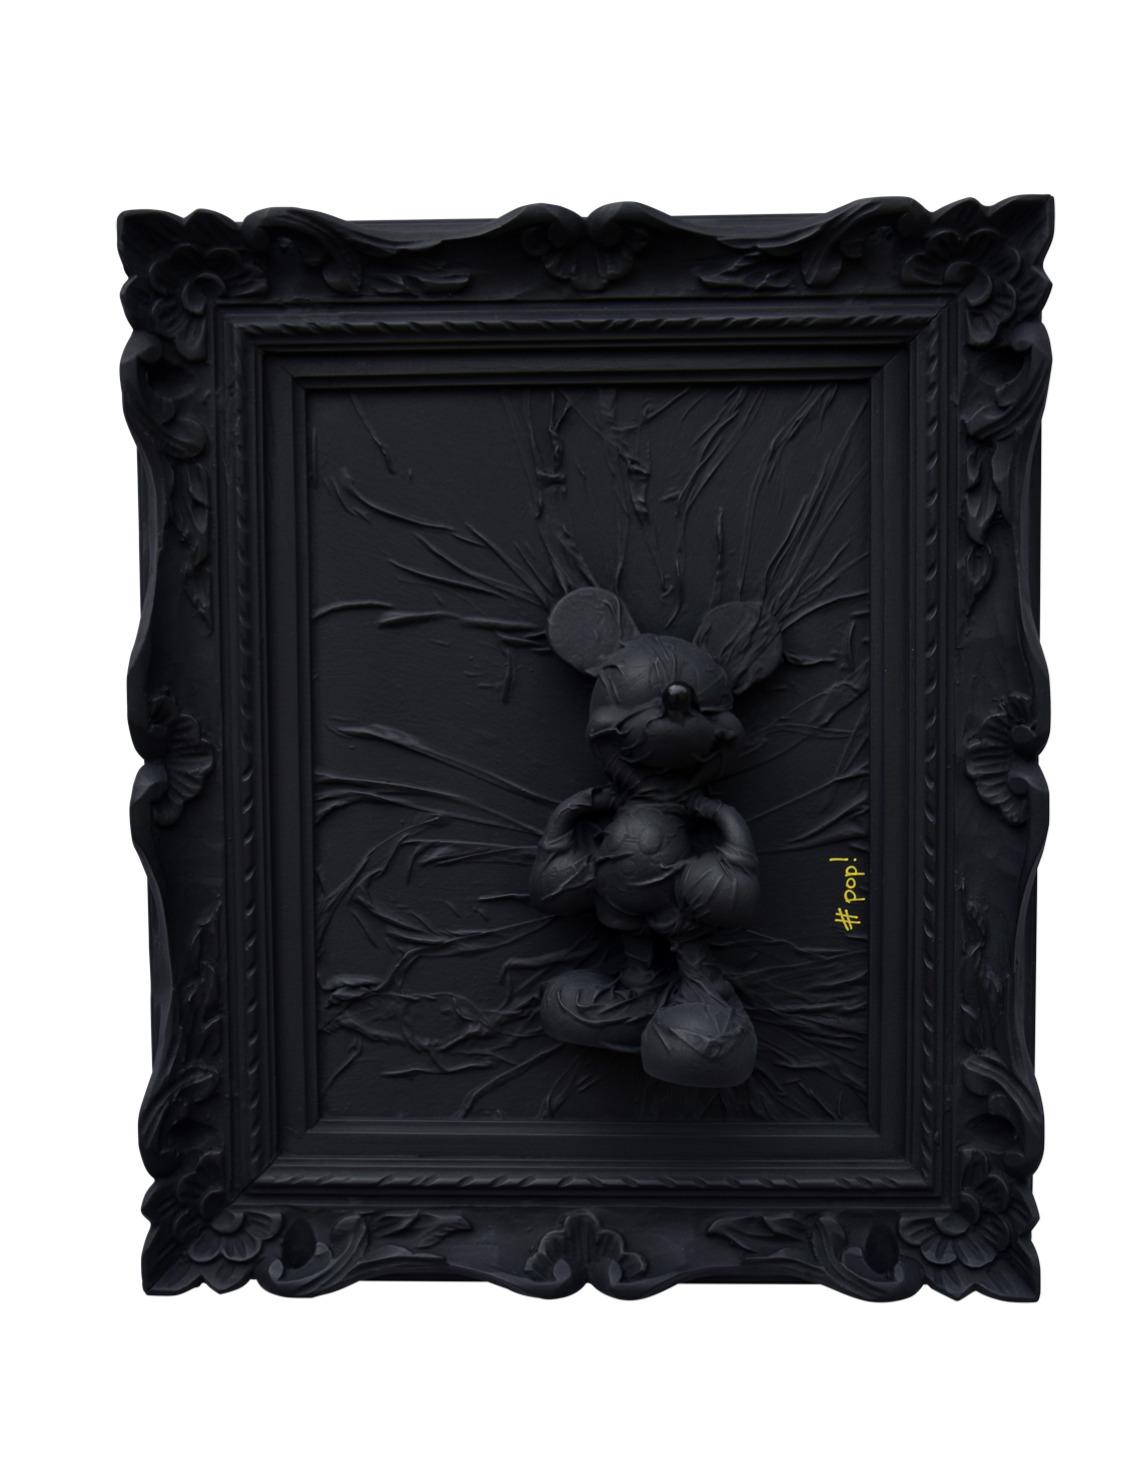 pop mini mickey disney black monochrome art street art did morères  treeheart